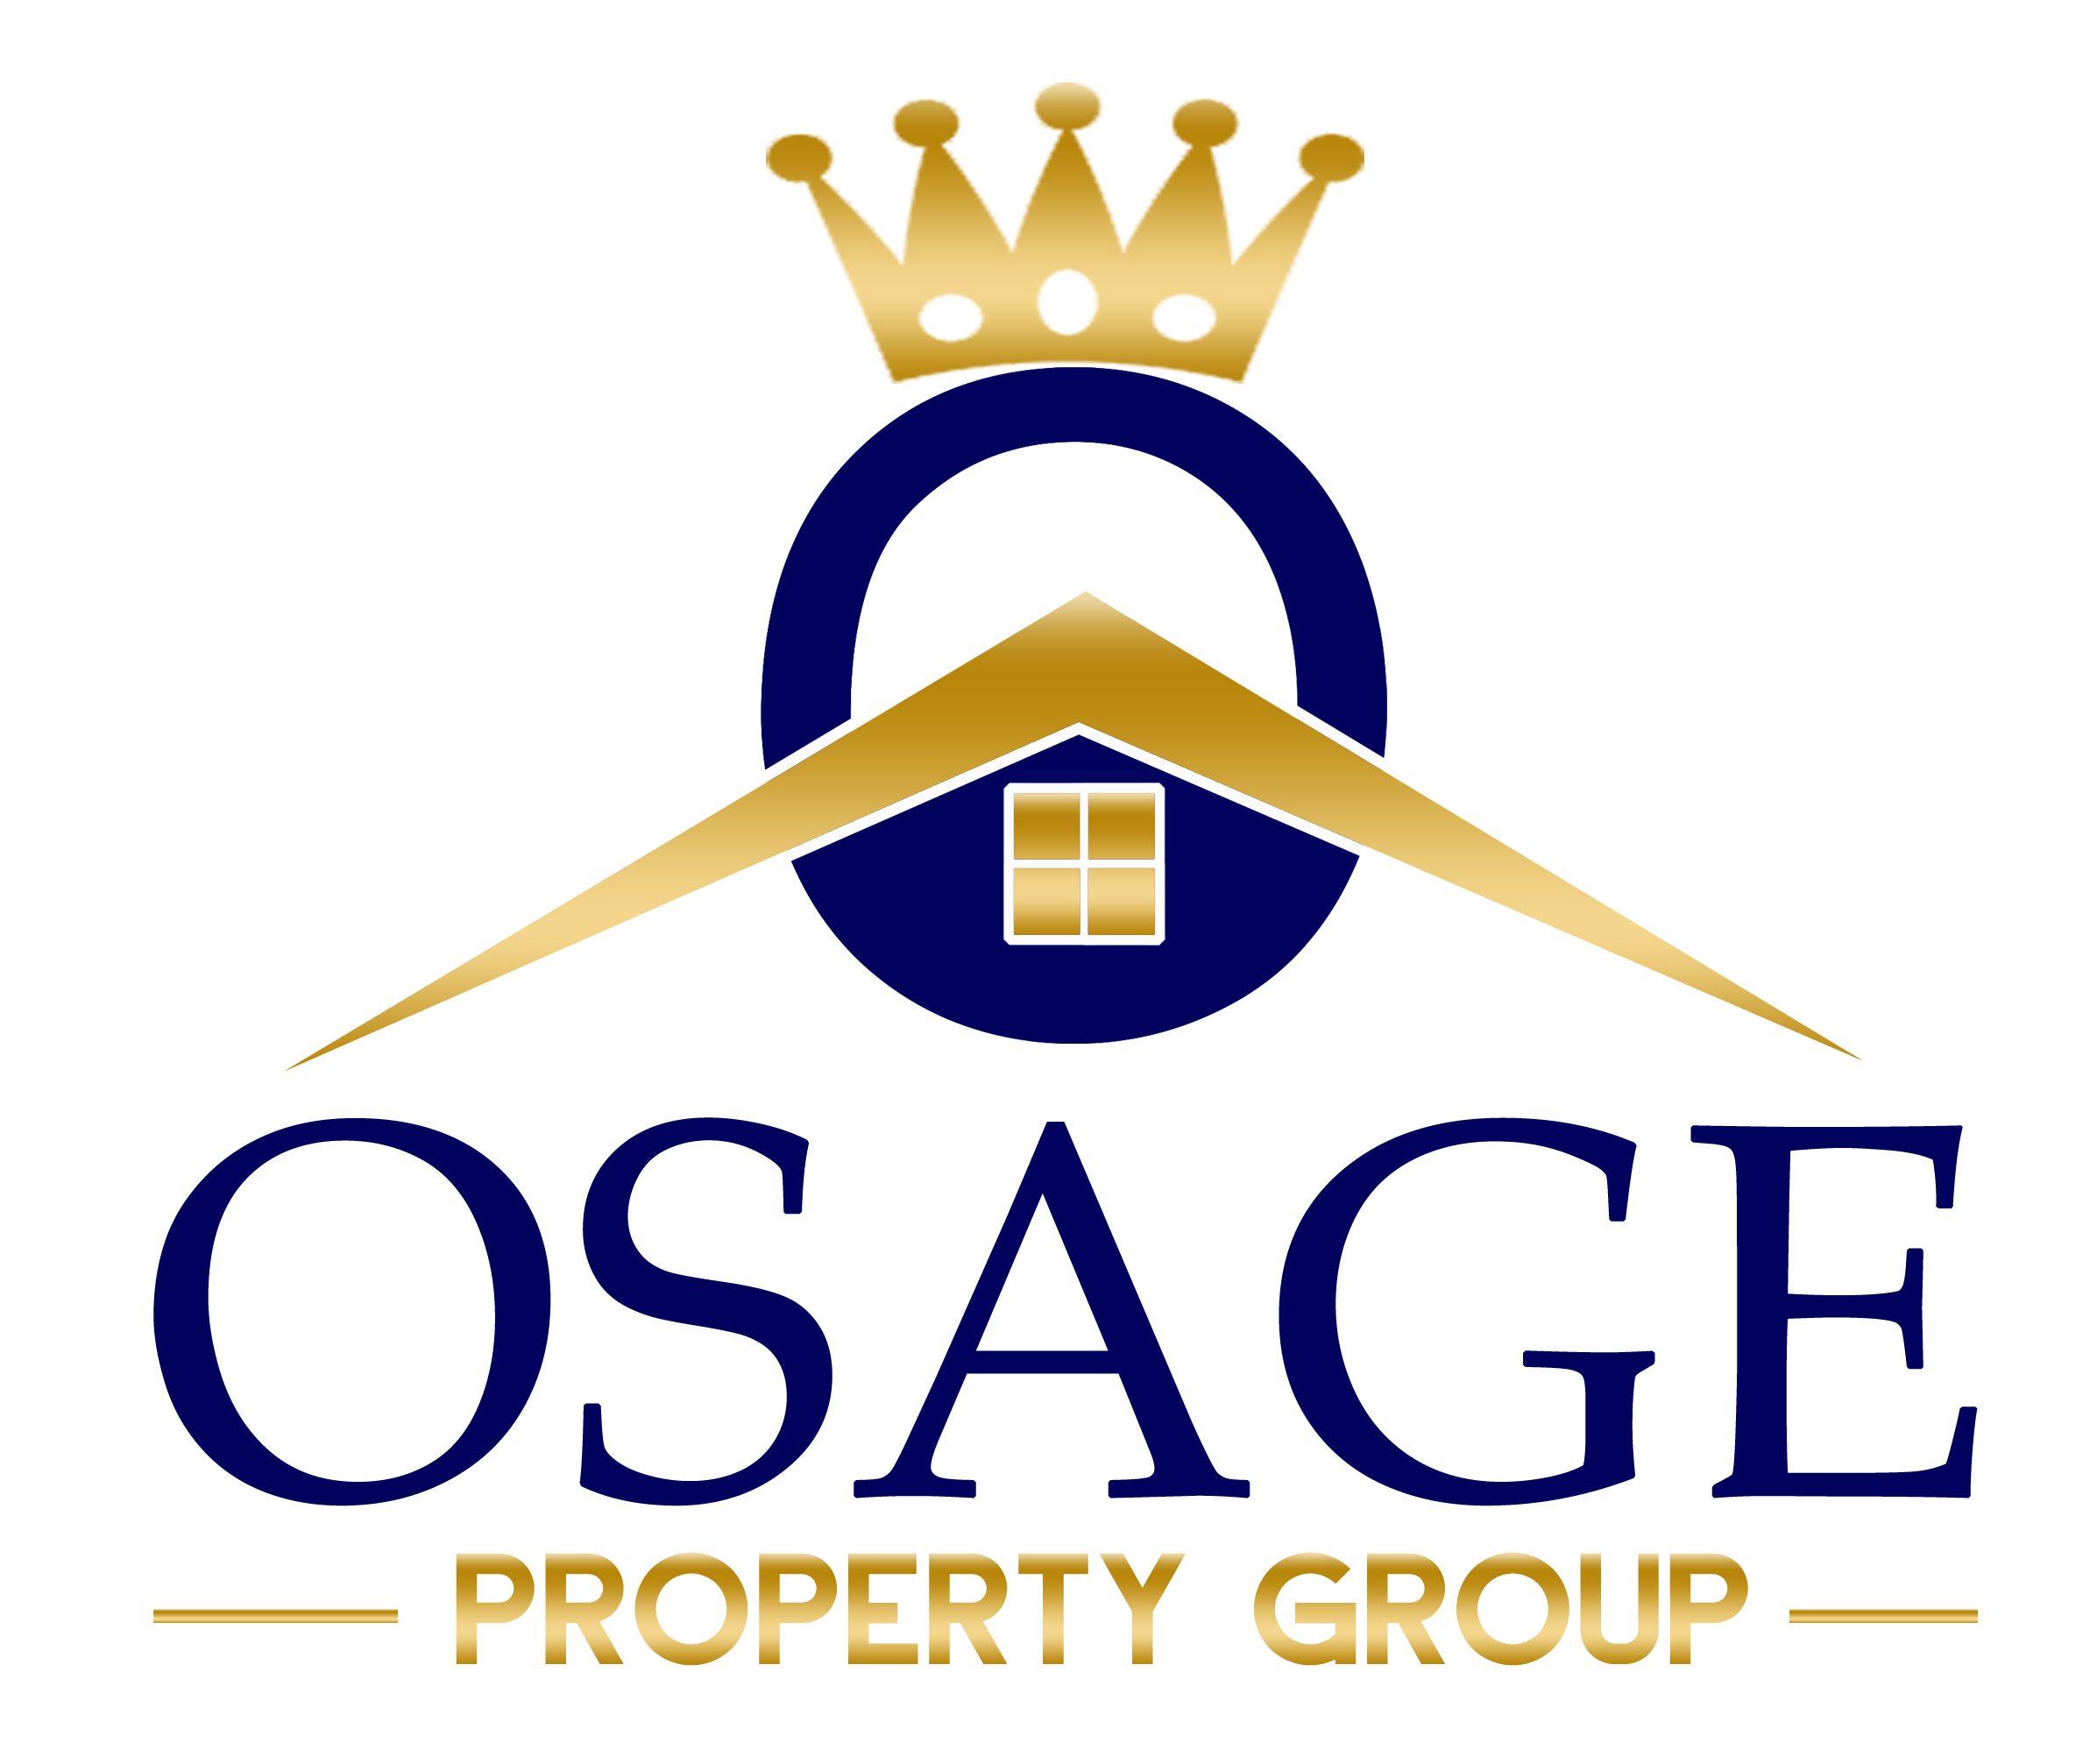 Osage Property Group, LLC